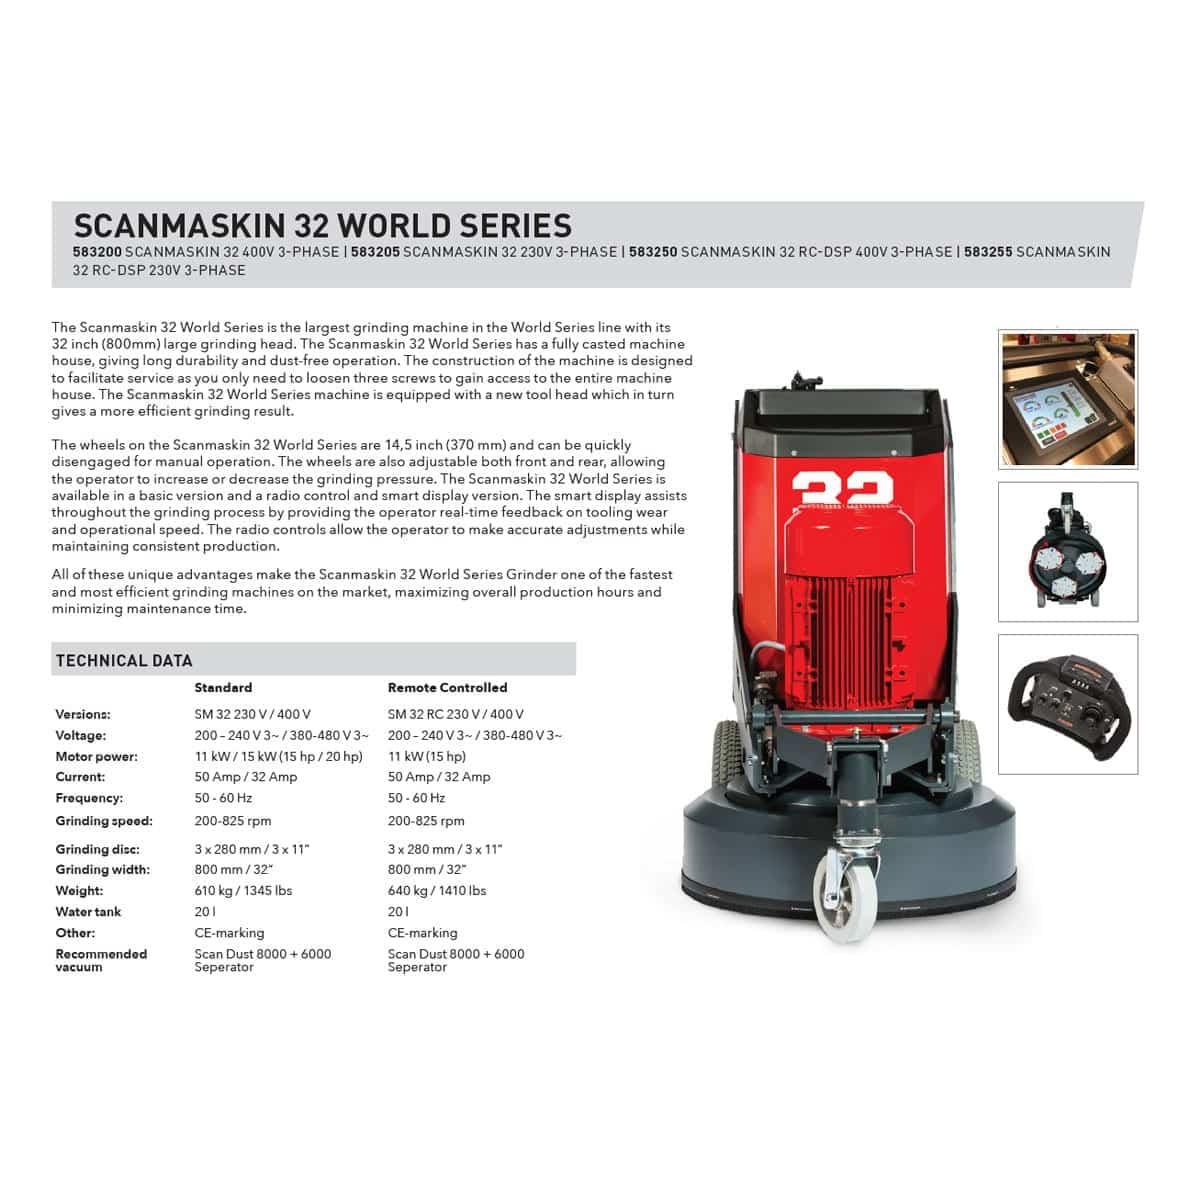 Sales Sheet Scanmaskin 32 Remote Control Concrete Grinder Turning Point Supply North Carolina South Carolina